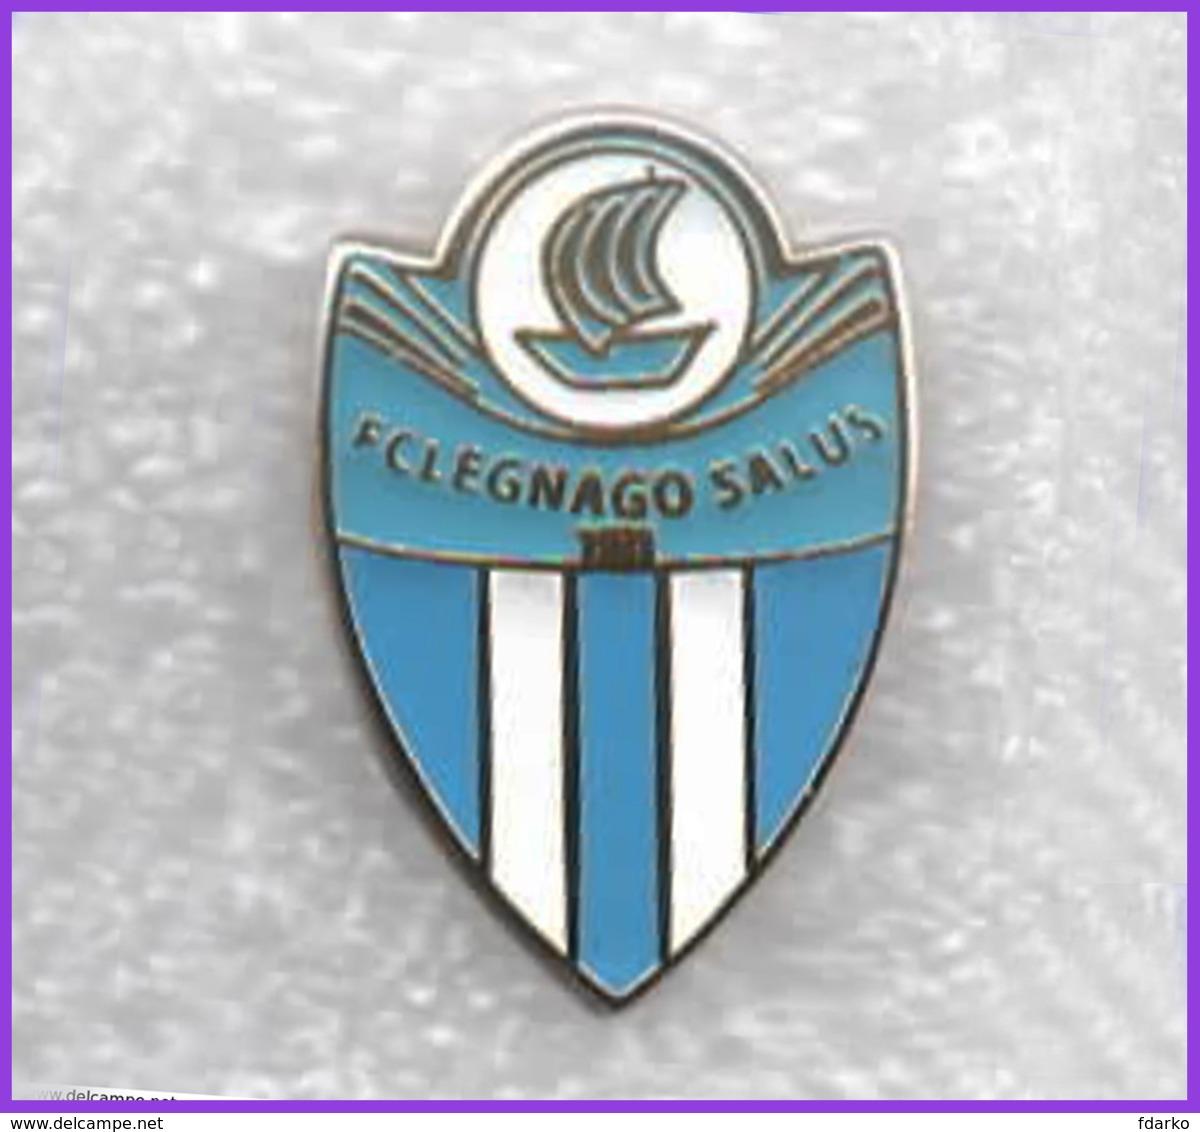 FC Legnago Salus Calcio Distintivi FootBall Soccer Spilla Pins Italy - Calcio